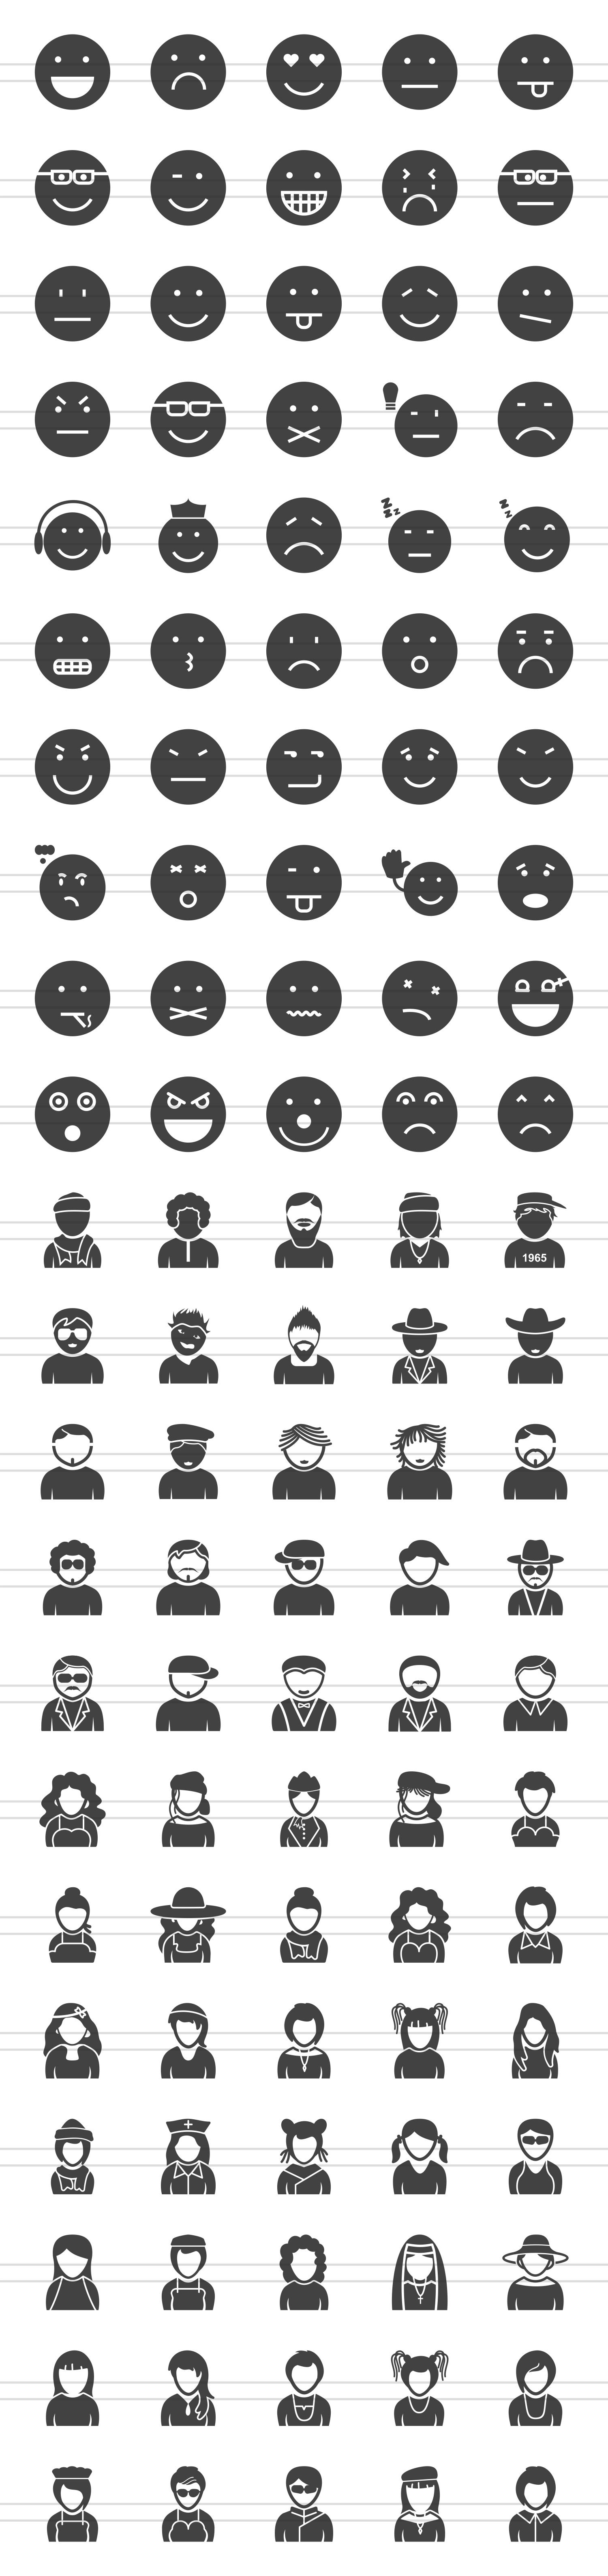 110 Avatars & Emoticons Glyph Icons example image 2